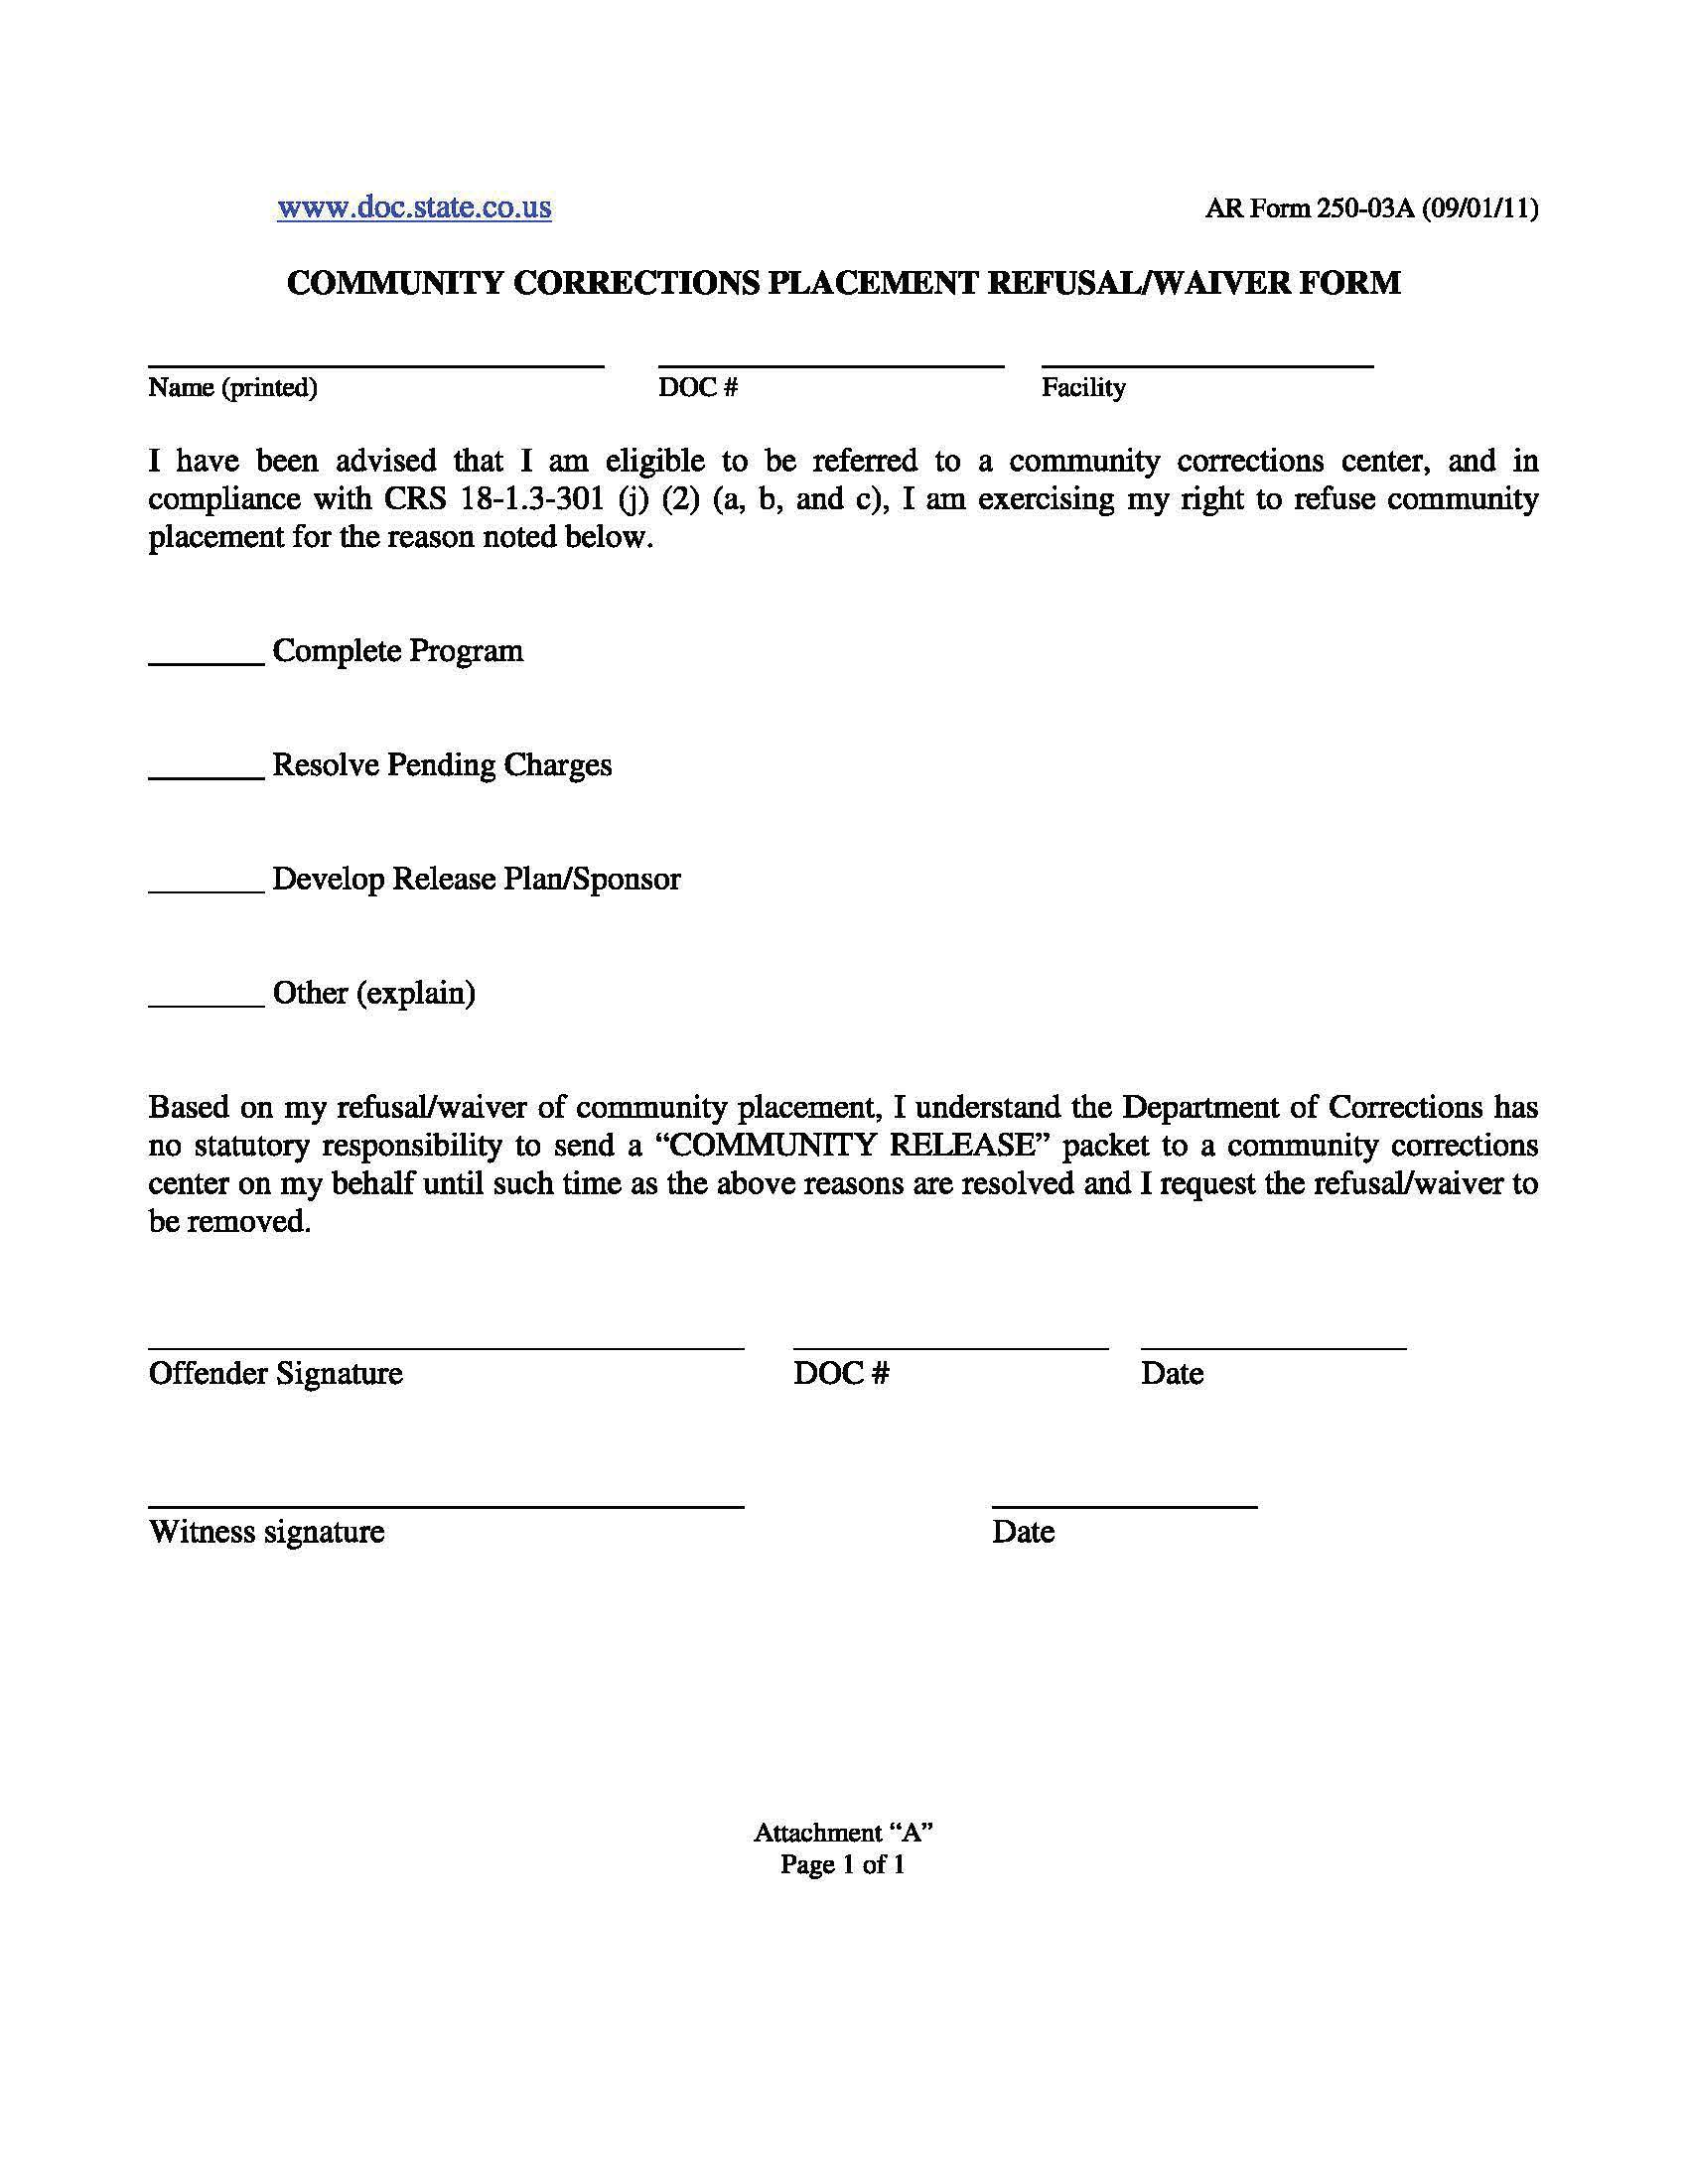 appointment letter format for legal advisor resume samples appointment letter format for legal advisor sample doctor appointment letter o resumebaking sample application letter law